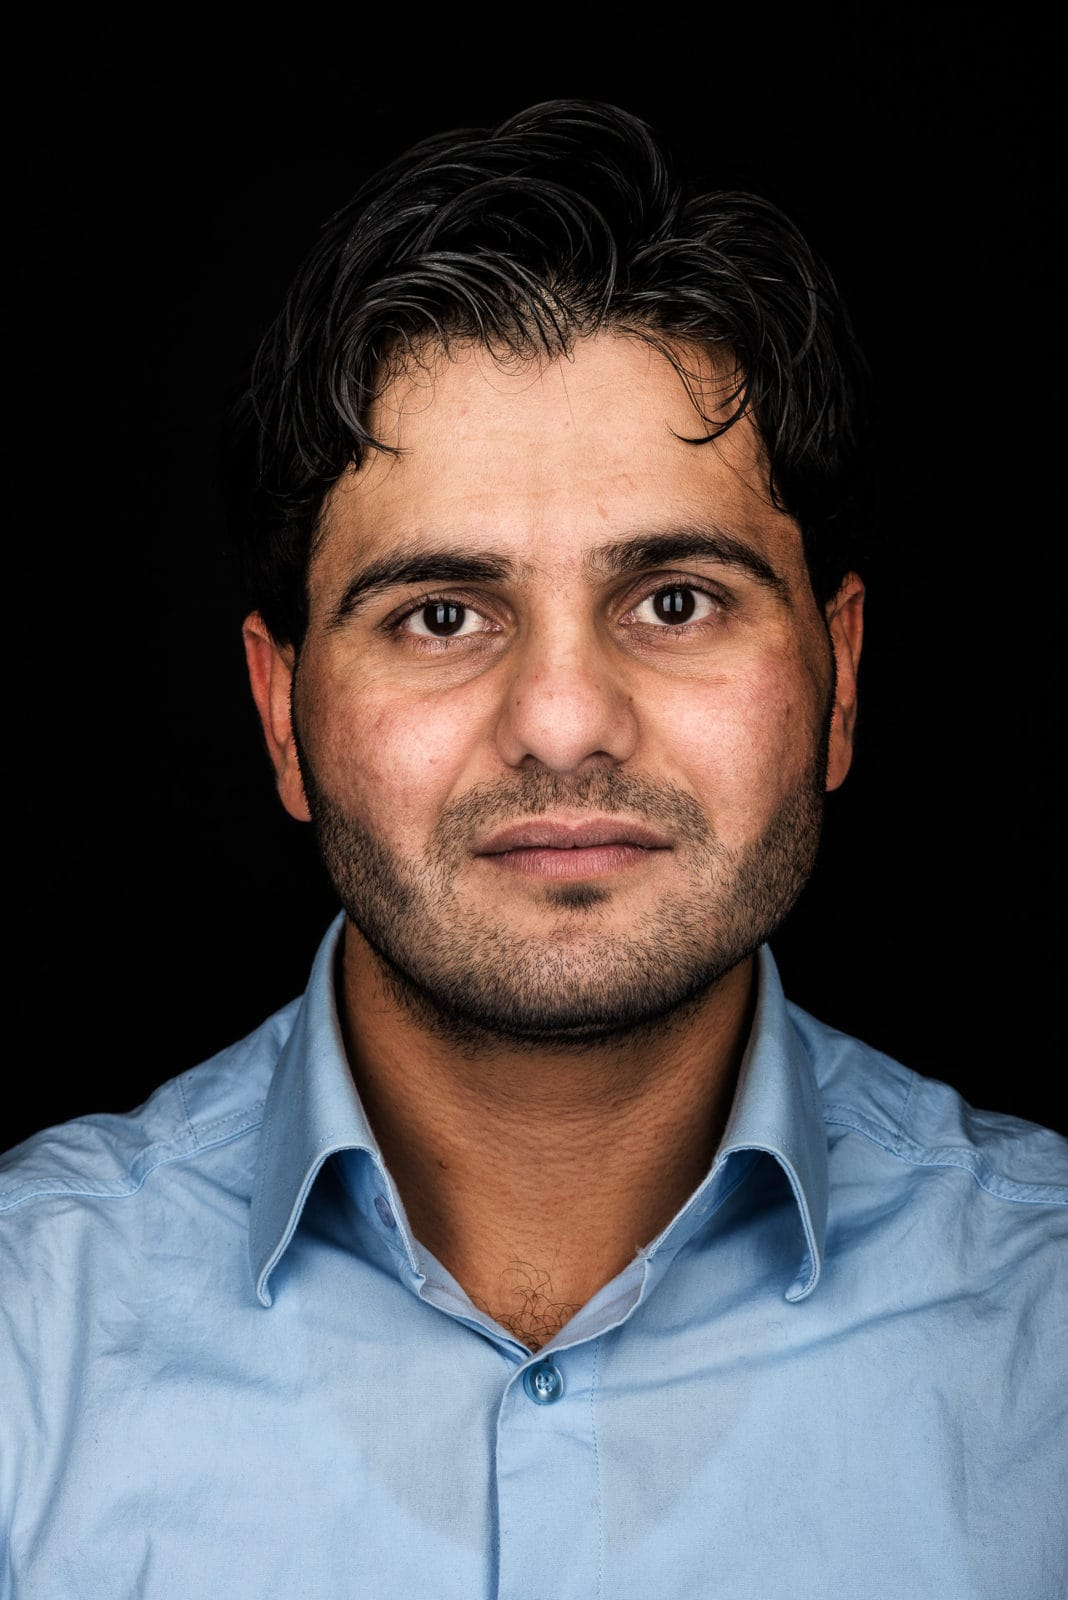 Portraits von Flüchtlingen /// REFUGEES - Markus Mielek, Fotograf Dortmund,